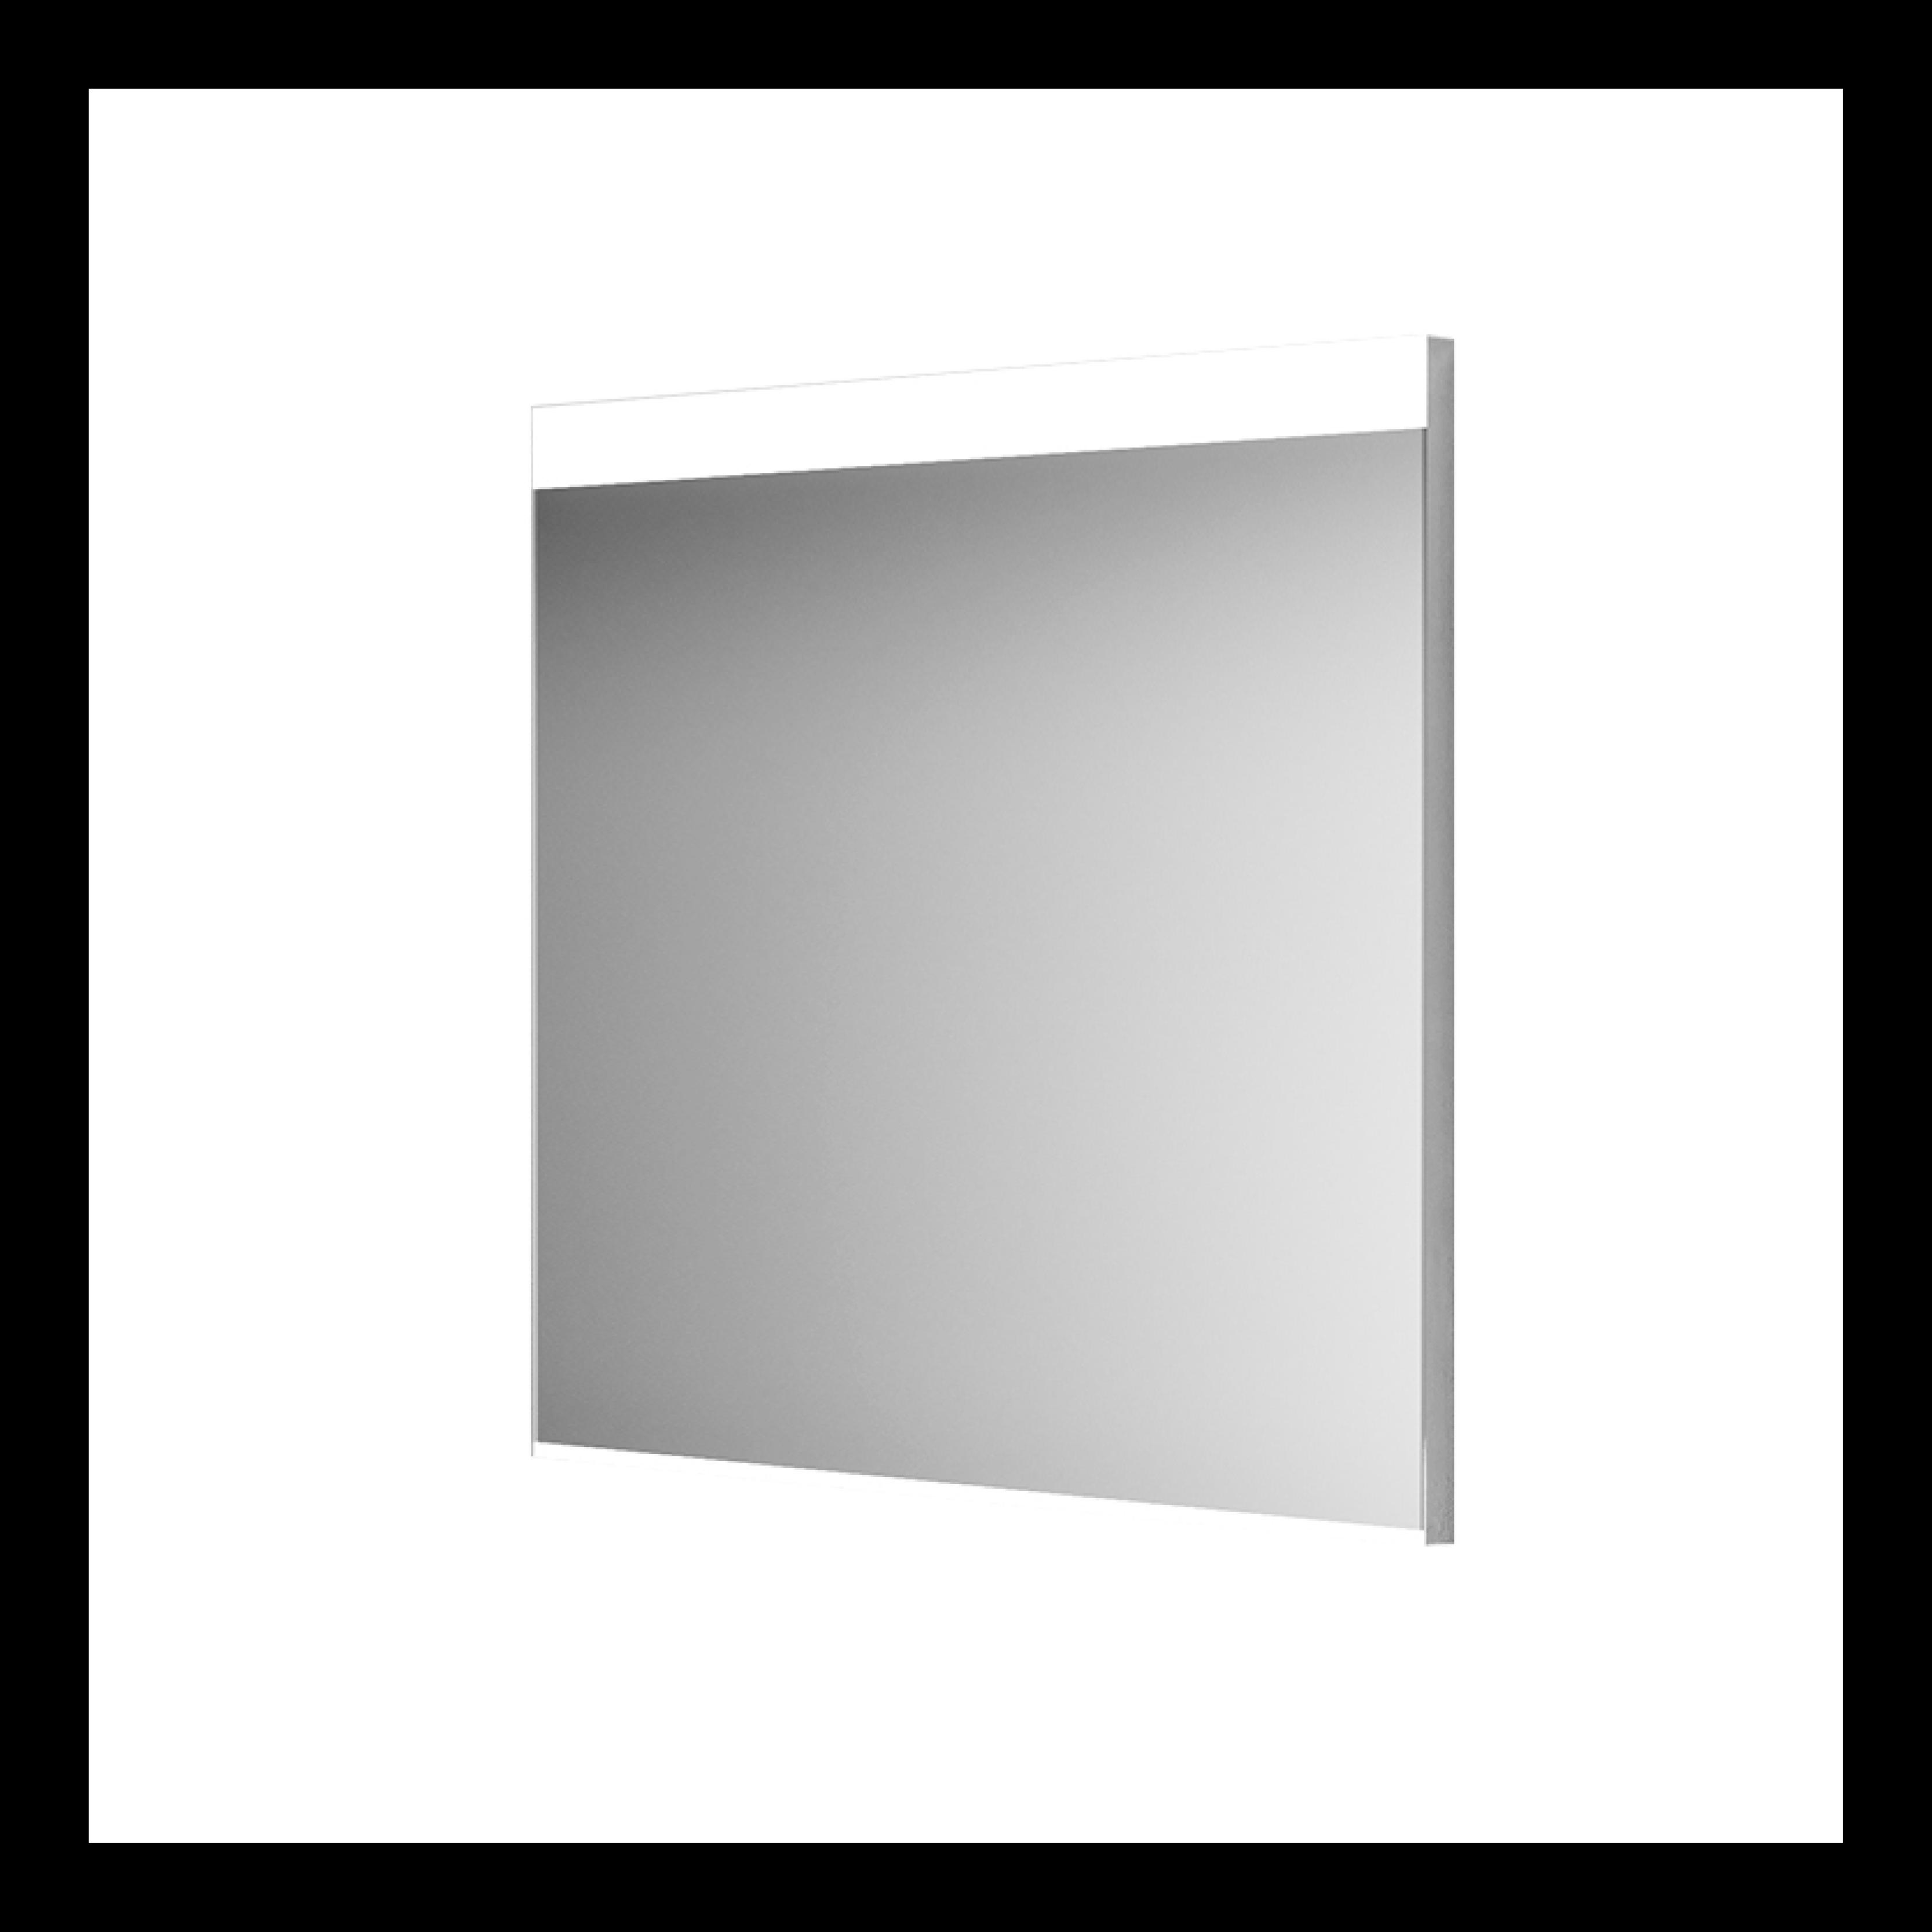 Oglinda cu LED Andromeda, 80 x 100 cm, AZ51058